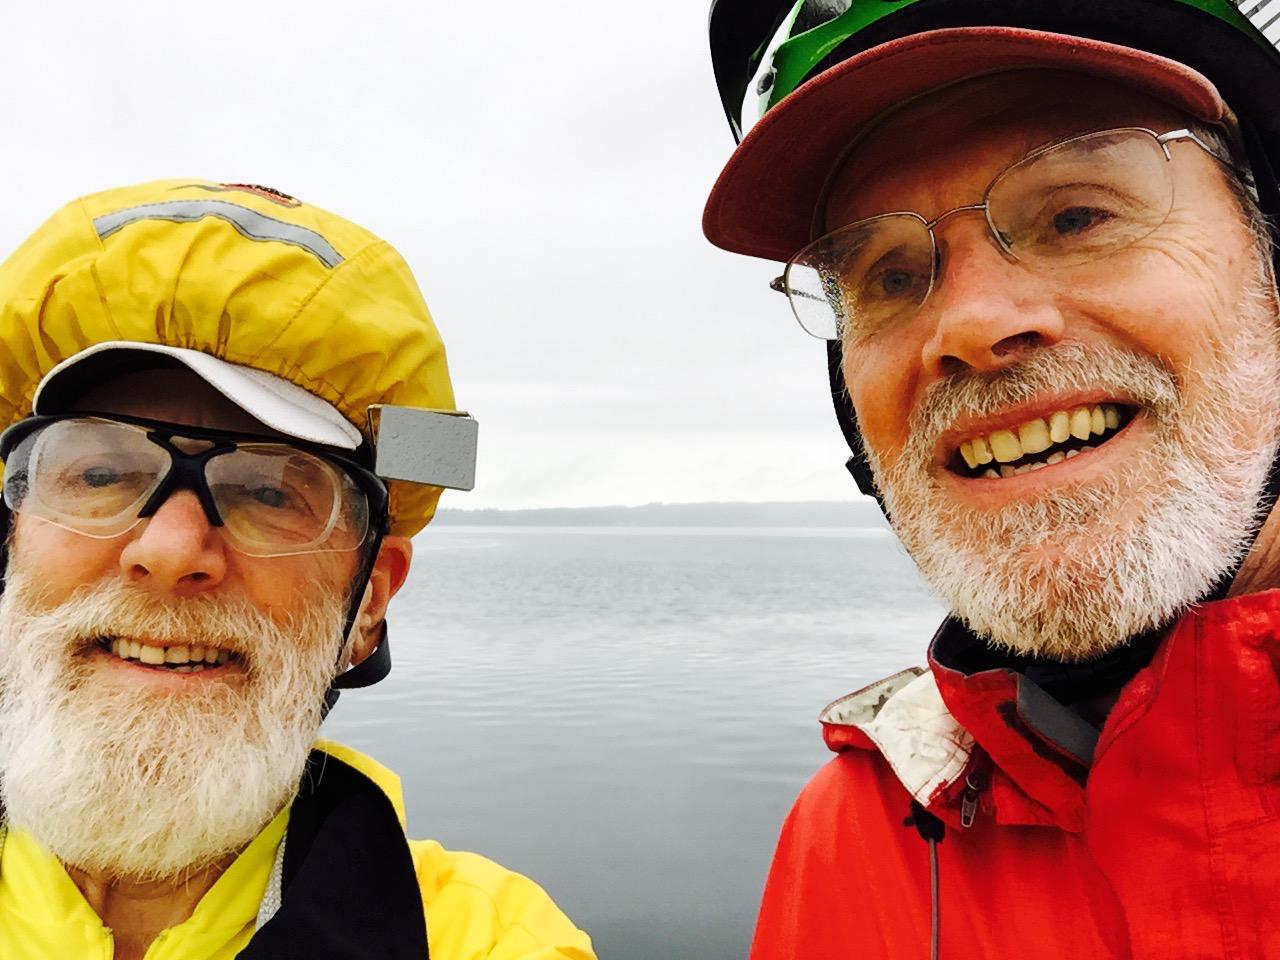 With John on the bridge.